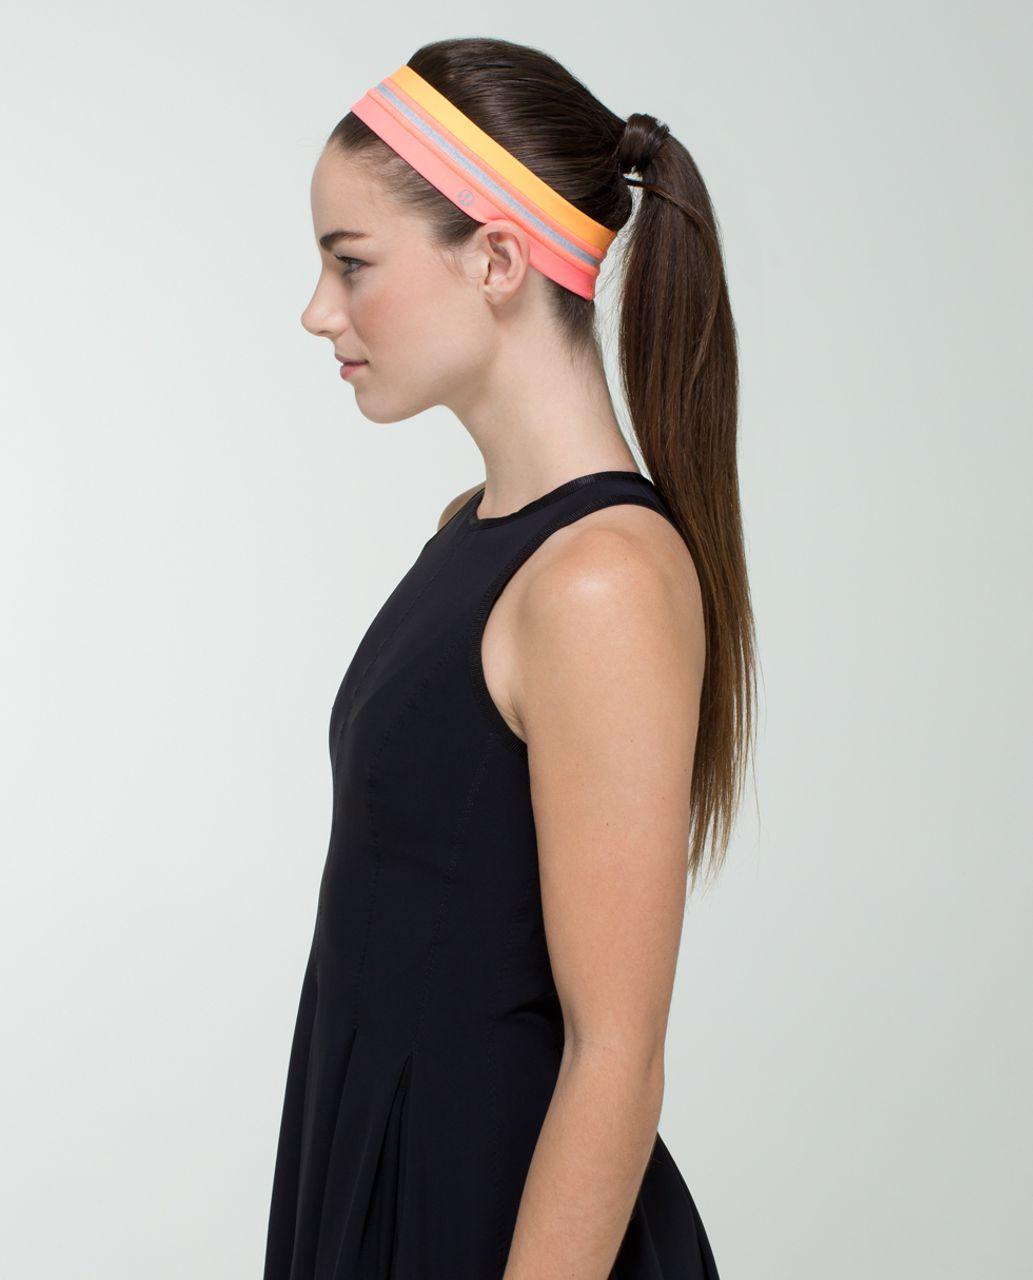 Lululemon Fly Away Tamer Headband *Quilt - Heathered Medium Grey / Creamsicle Pop / Very Light Flare